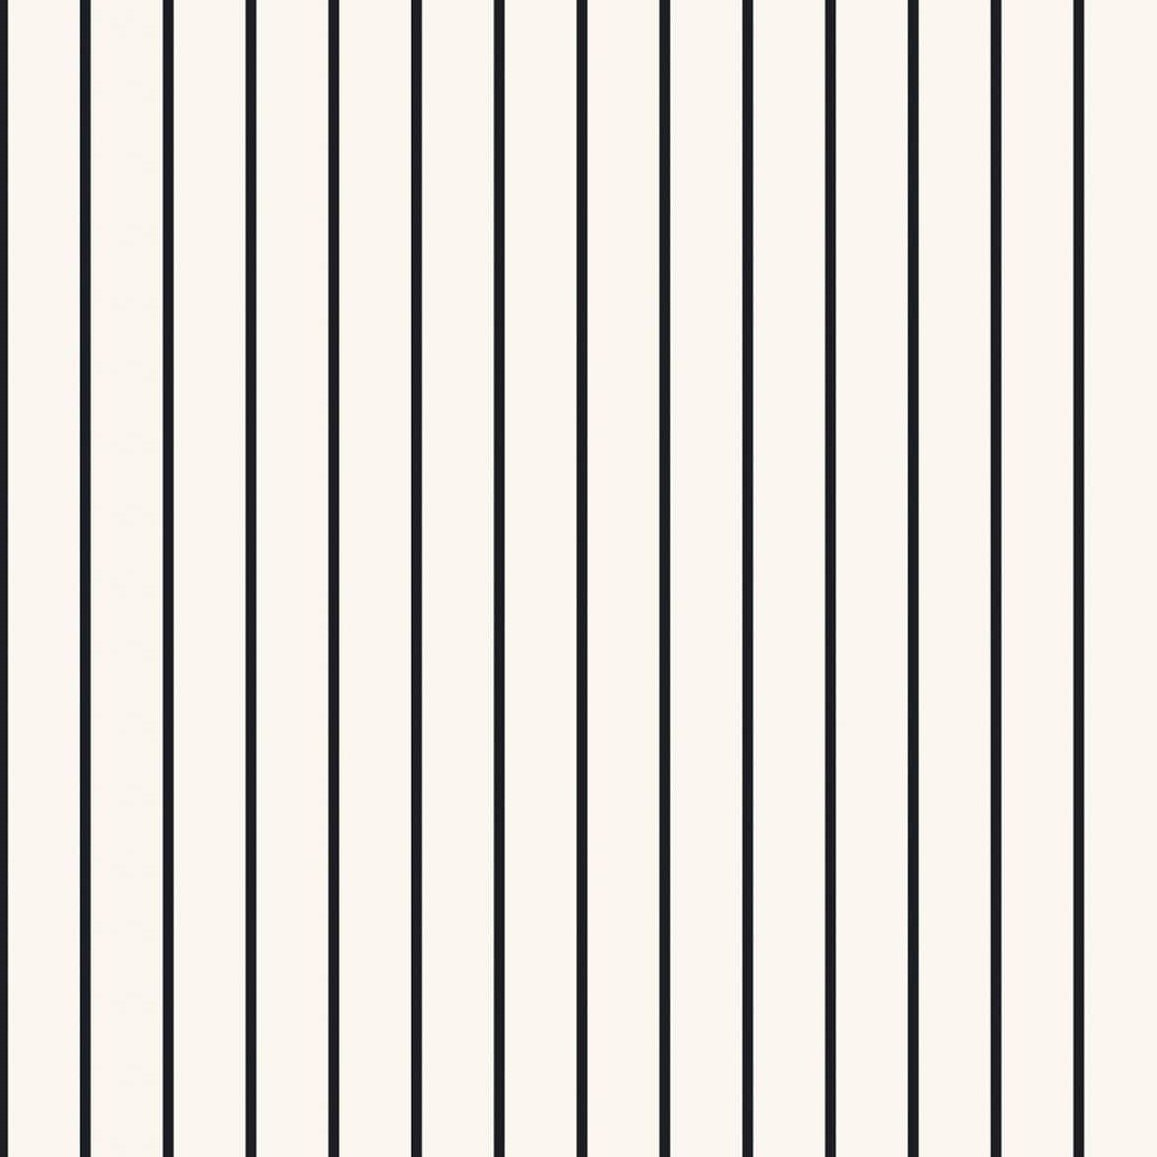 Rand - Scandinavian Stripes - allatidersskebo